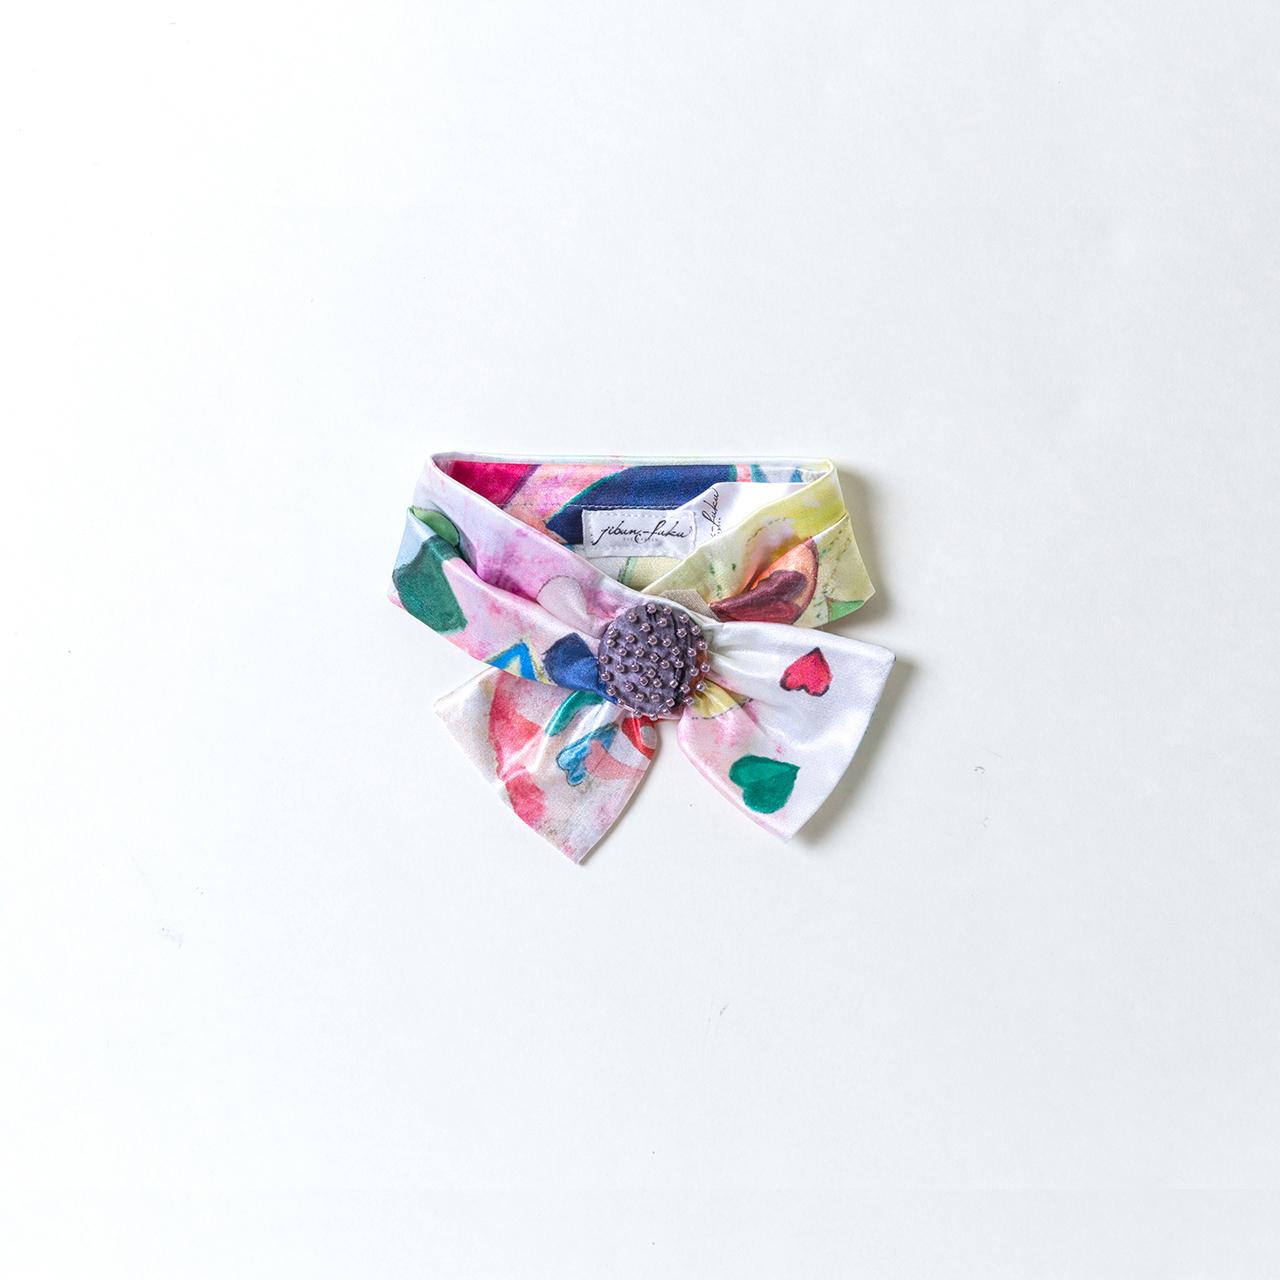 jibun-fuku DOG 【リボンカラーbeads】 DOGRB201855